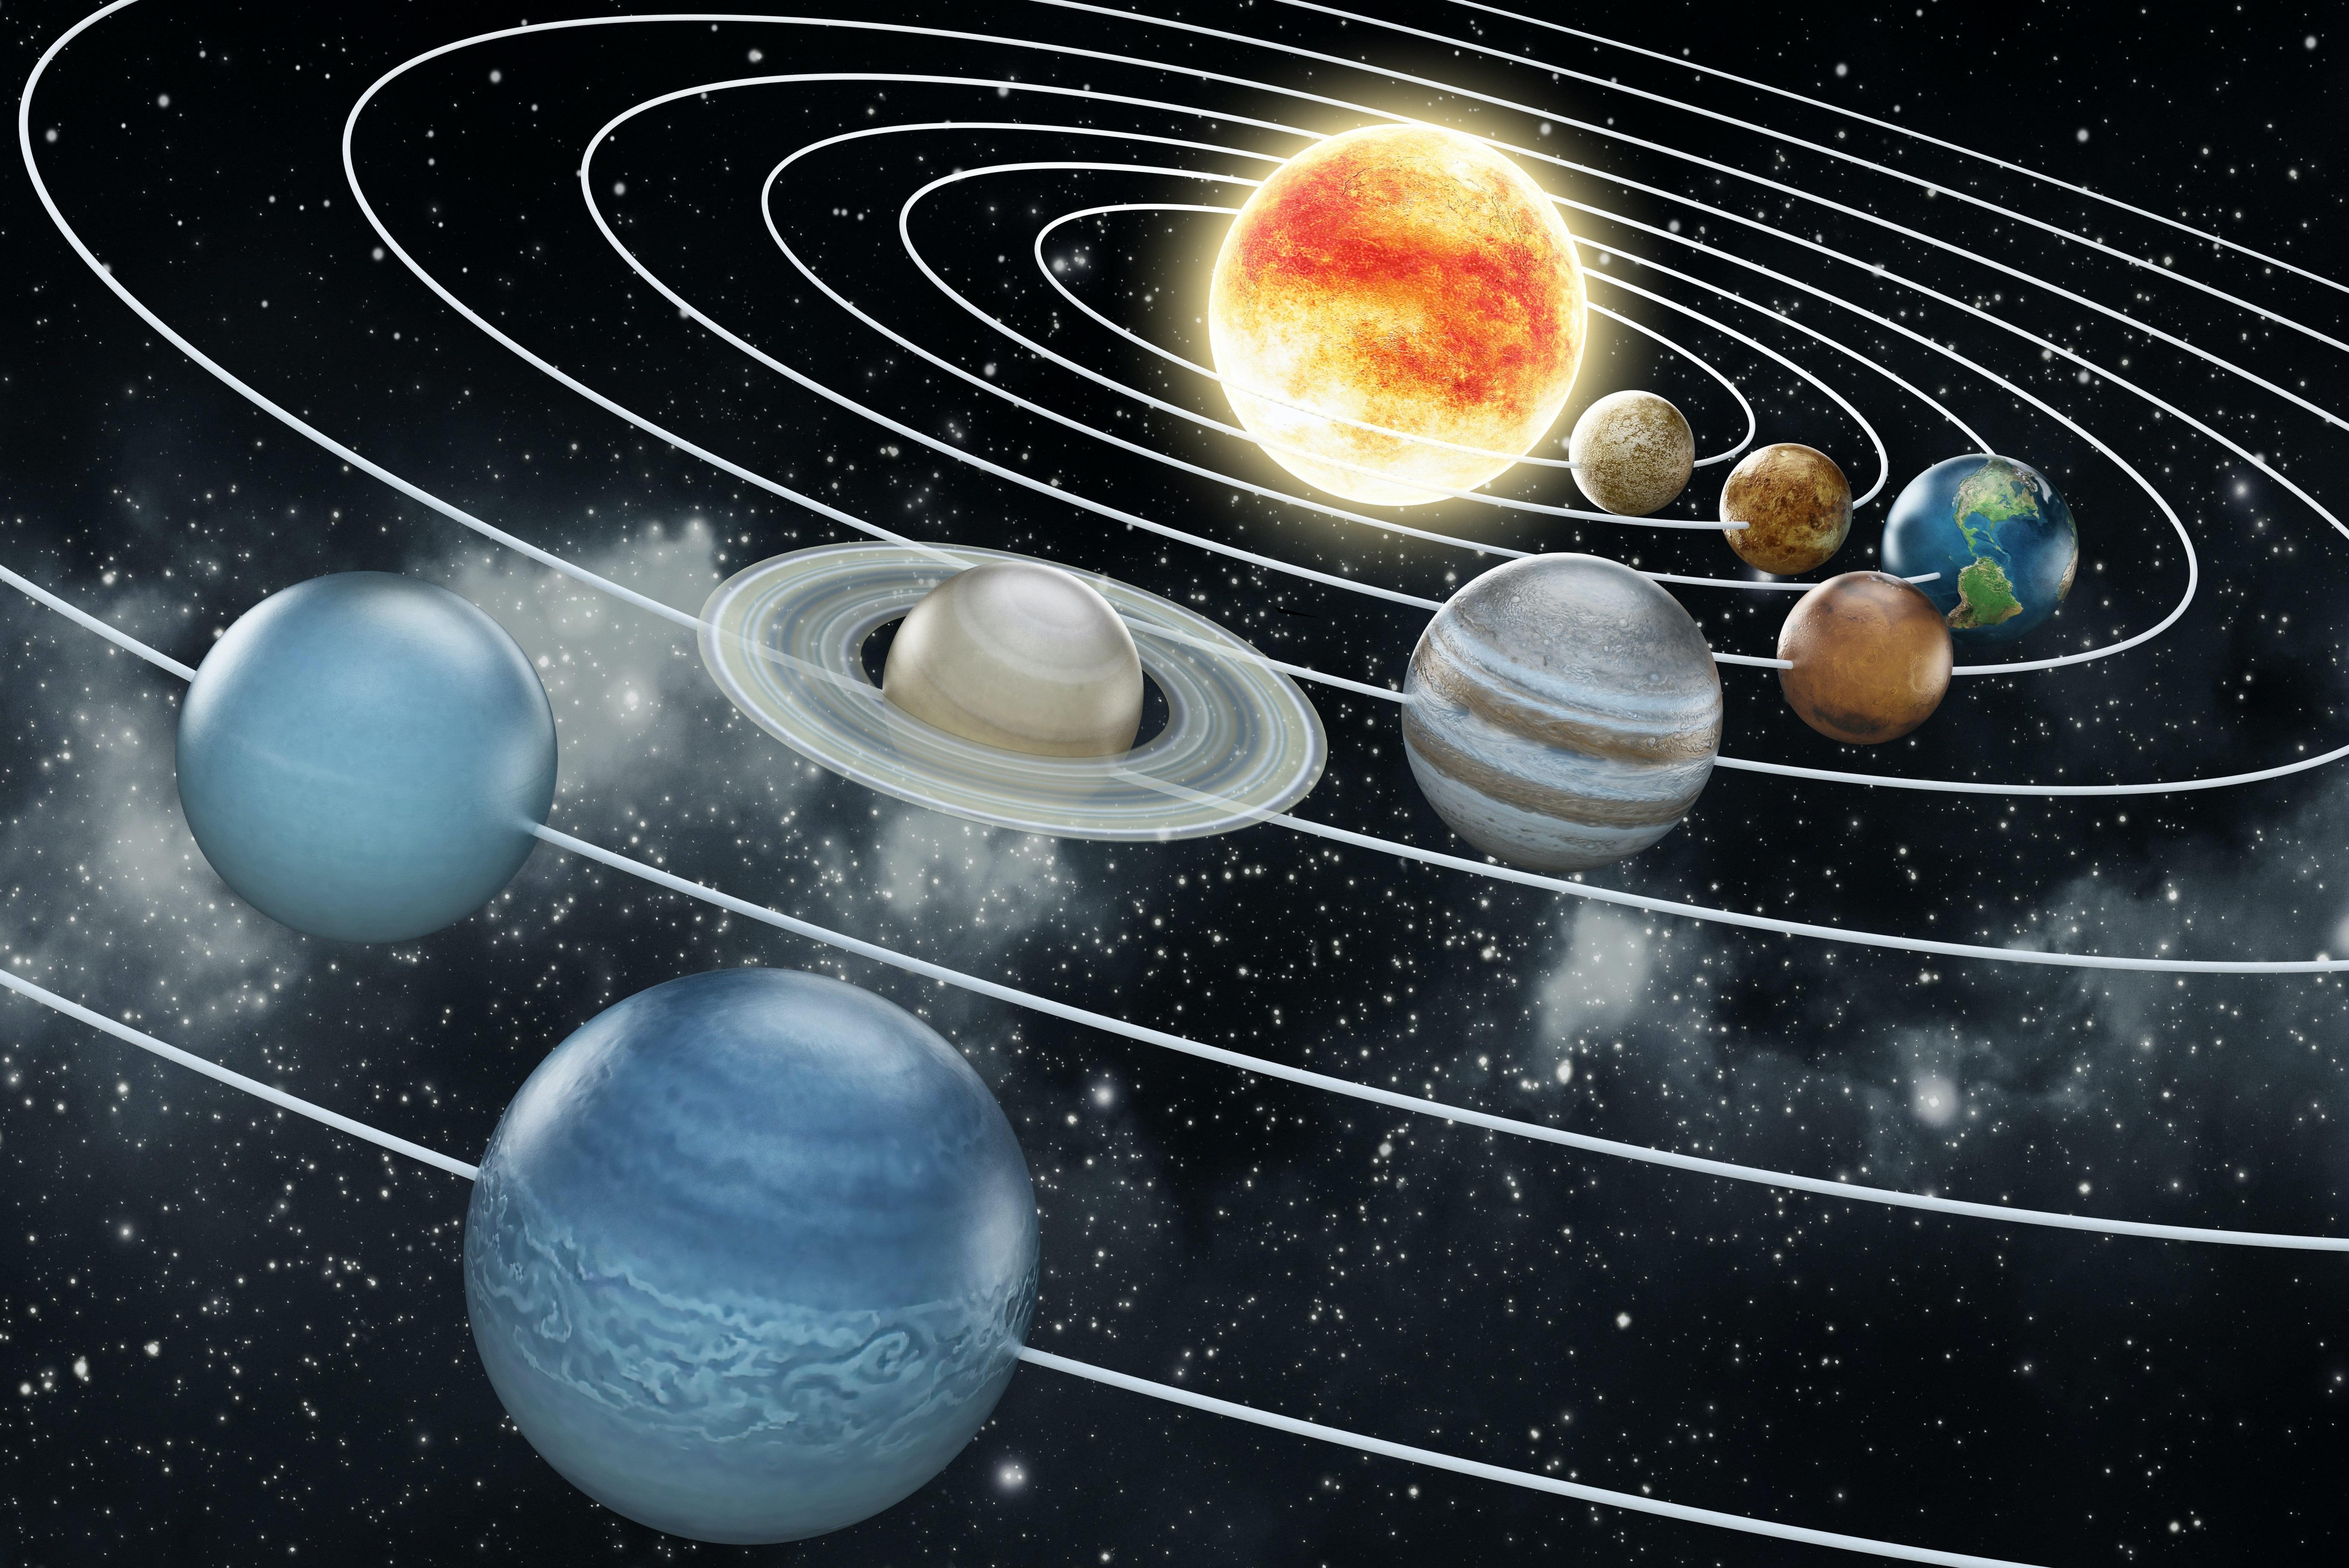 Fakta om Solsystemet